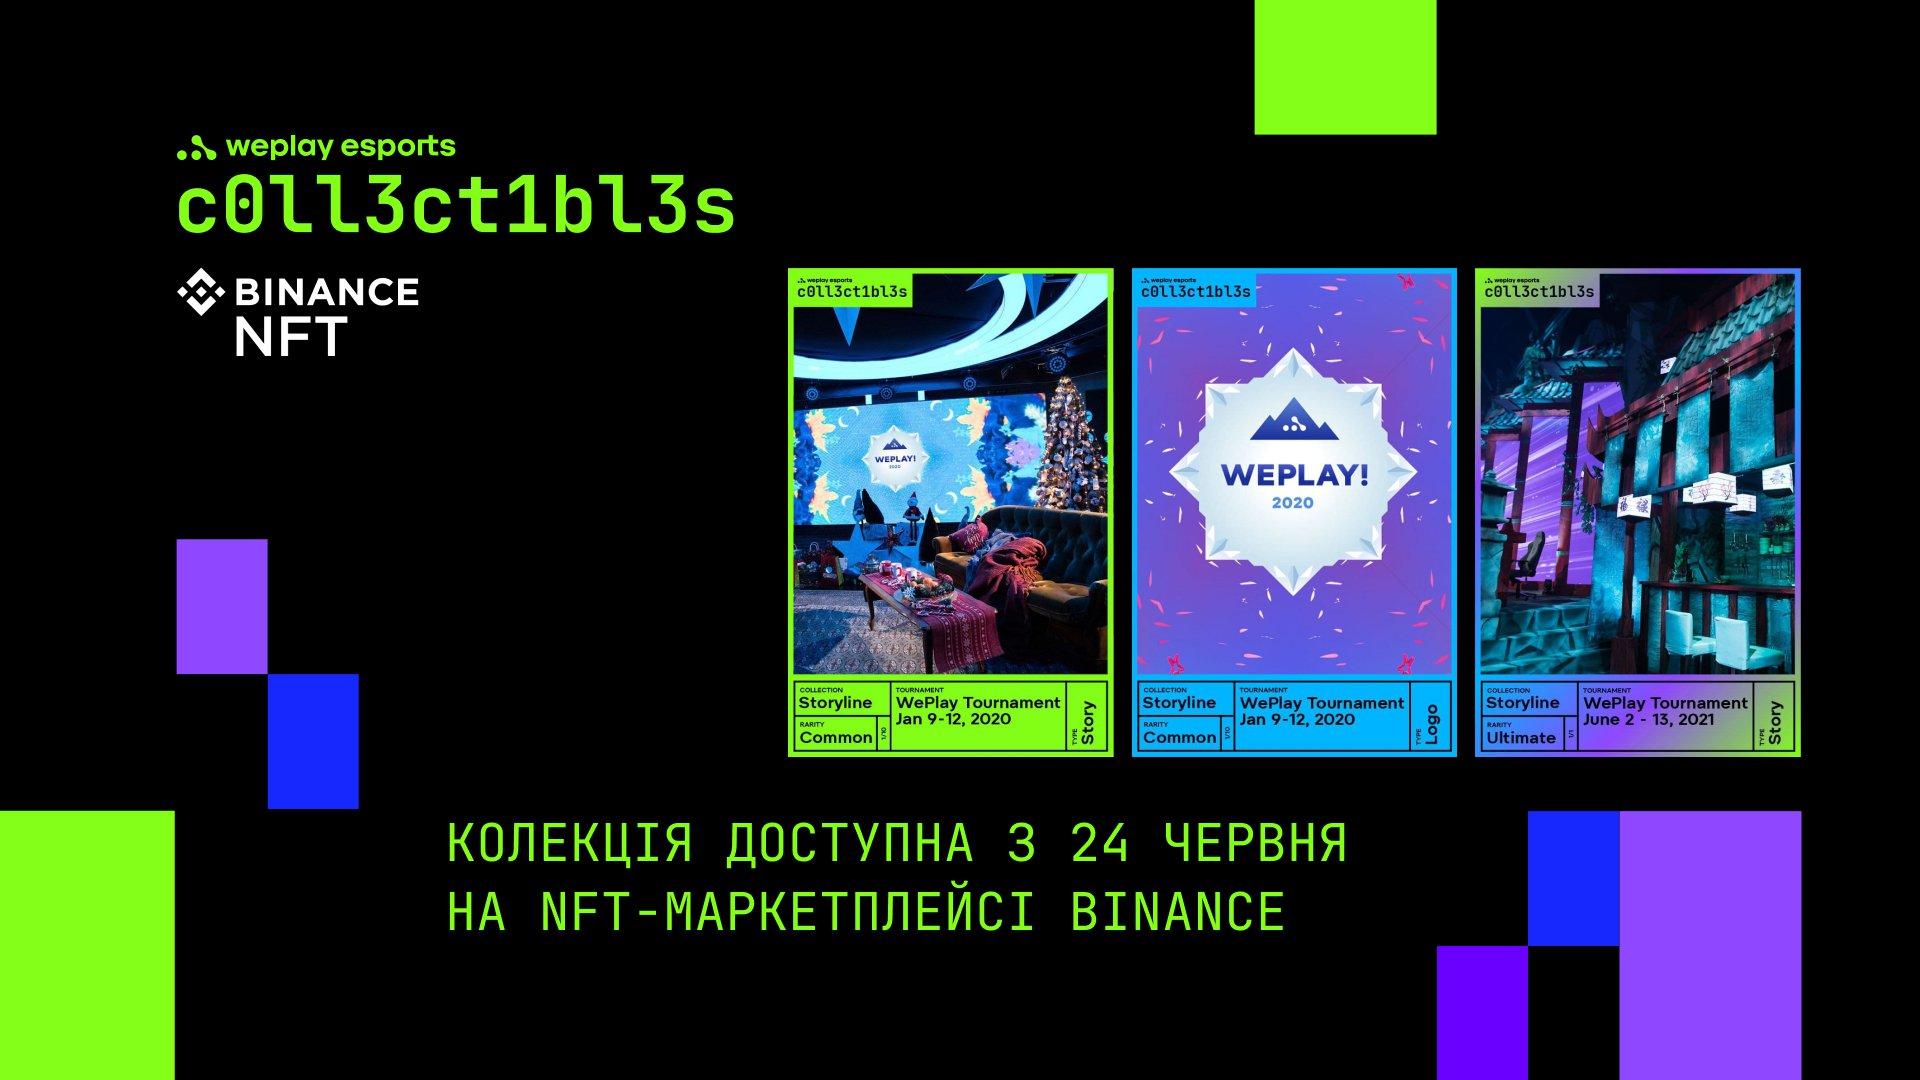 WePlay Collectibles: Привіт, світе! Зображення: WePlay Holding